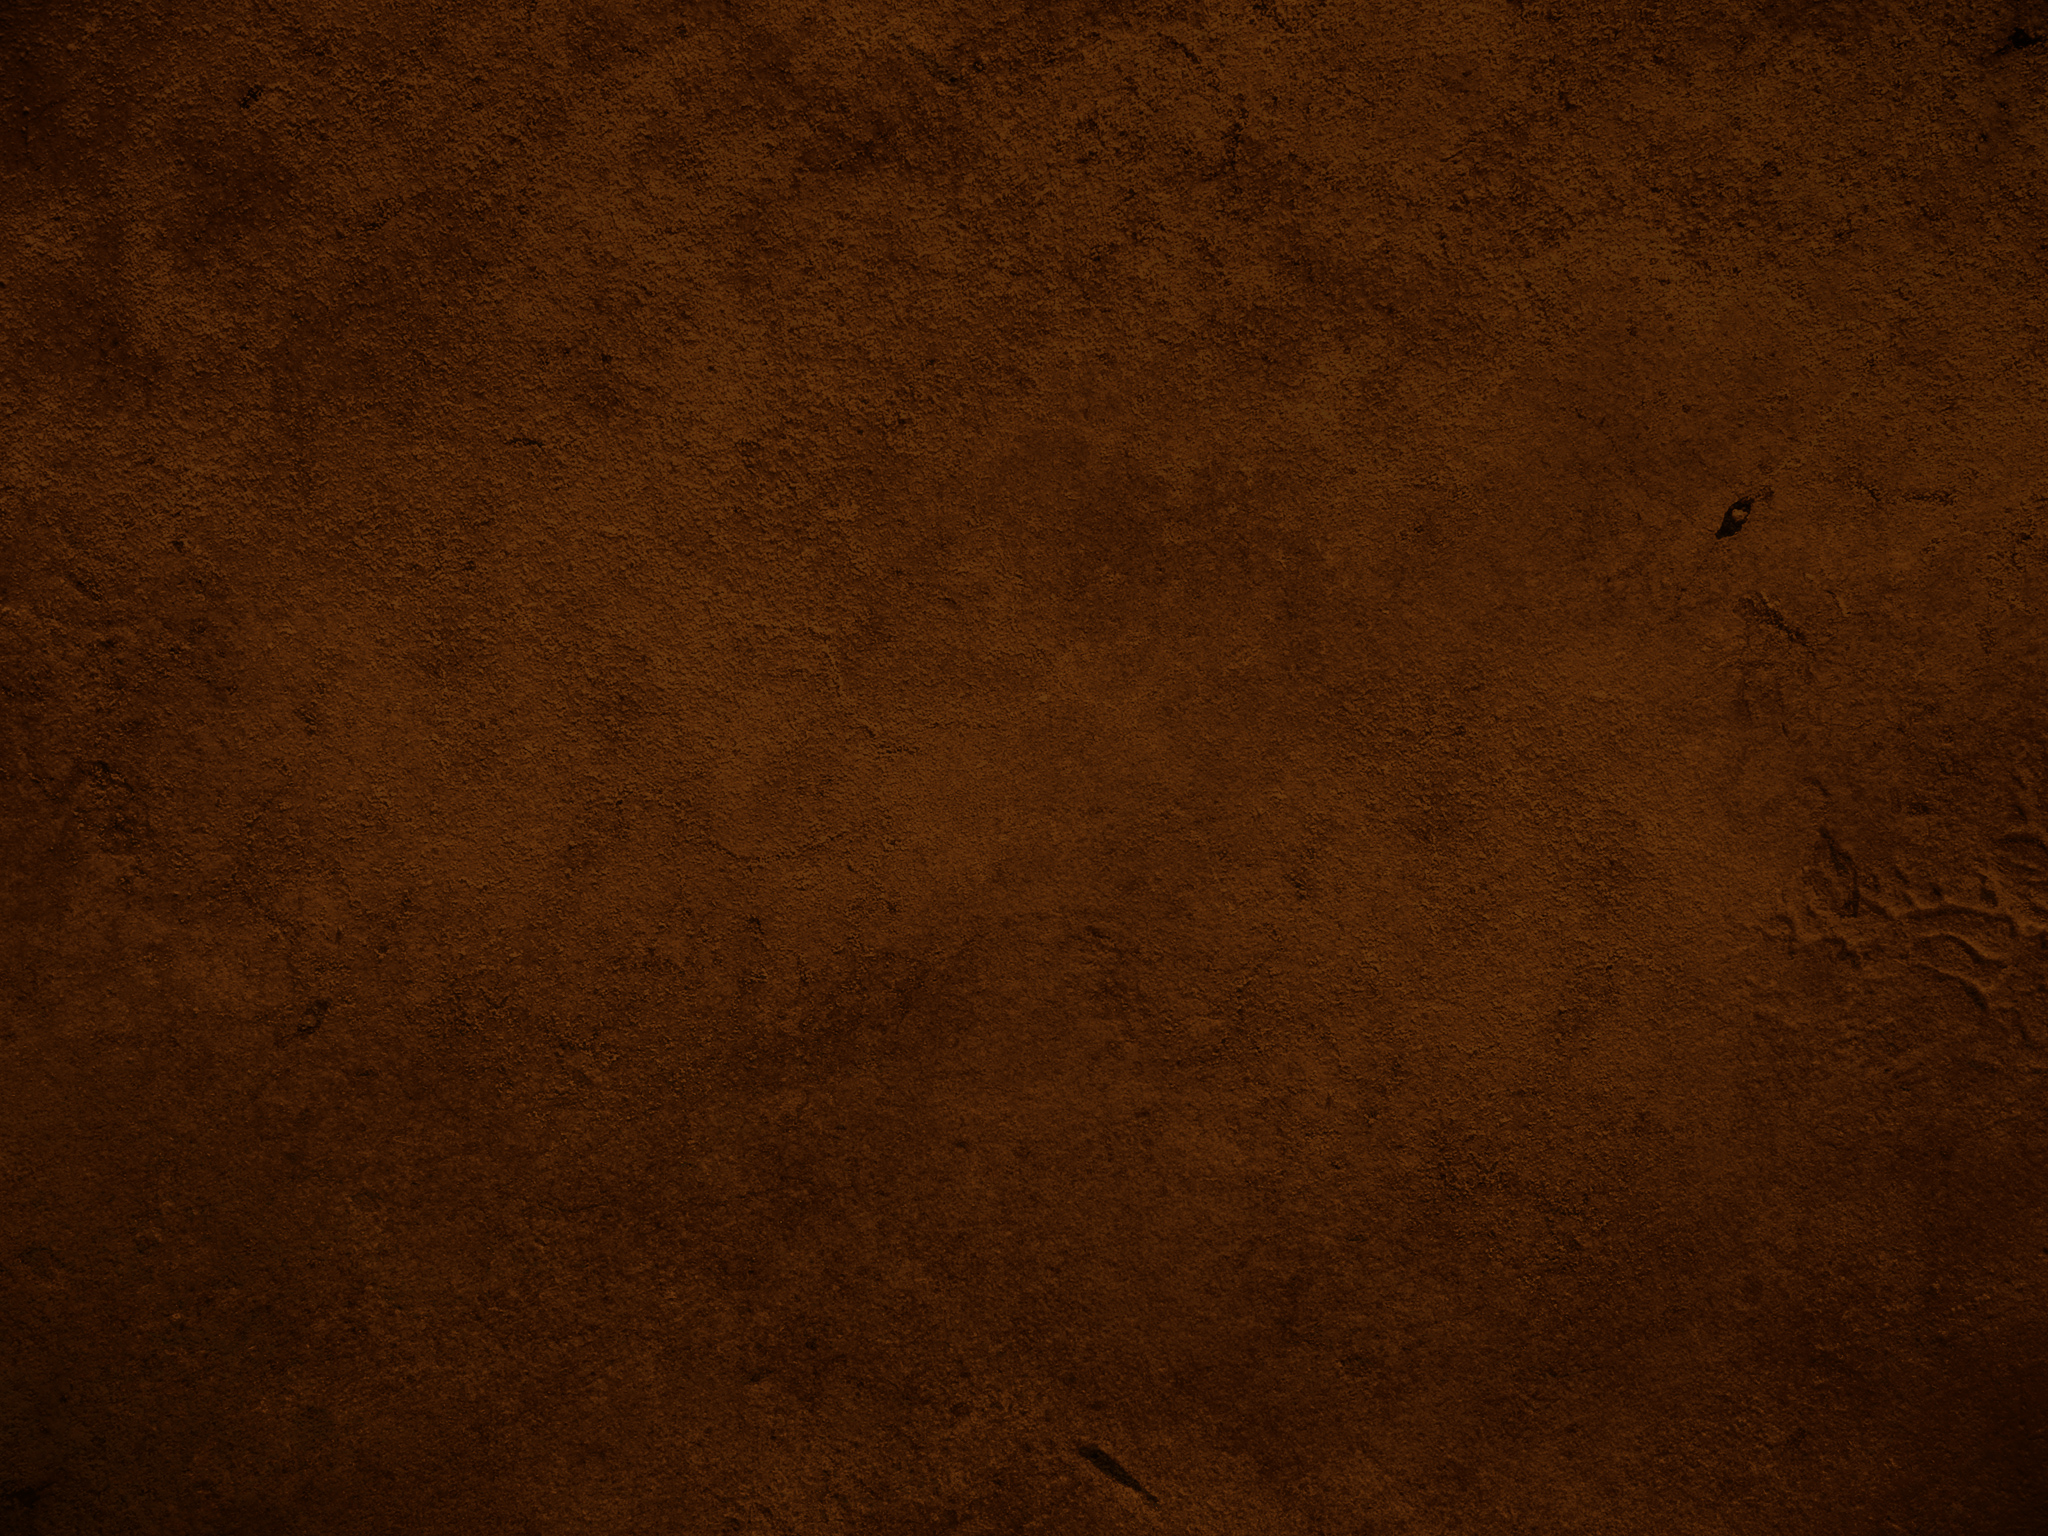 Brown Backgrounds wallpaper 2048x1536 82259 2048x1536